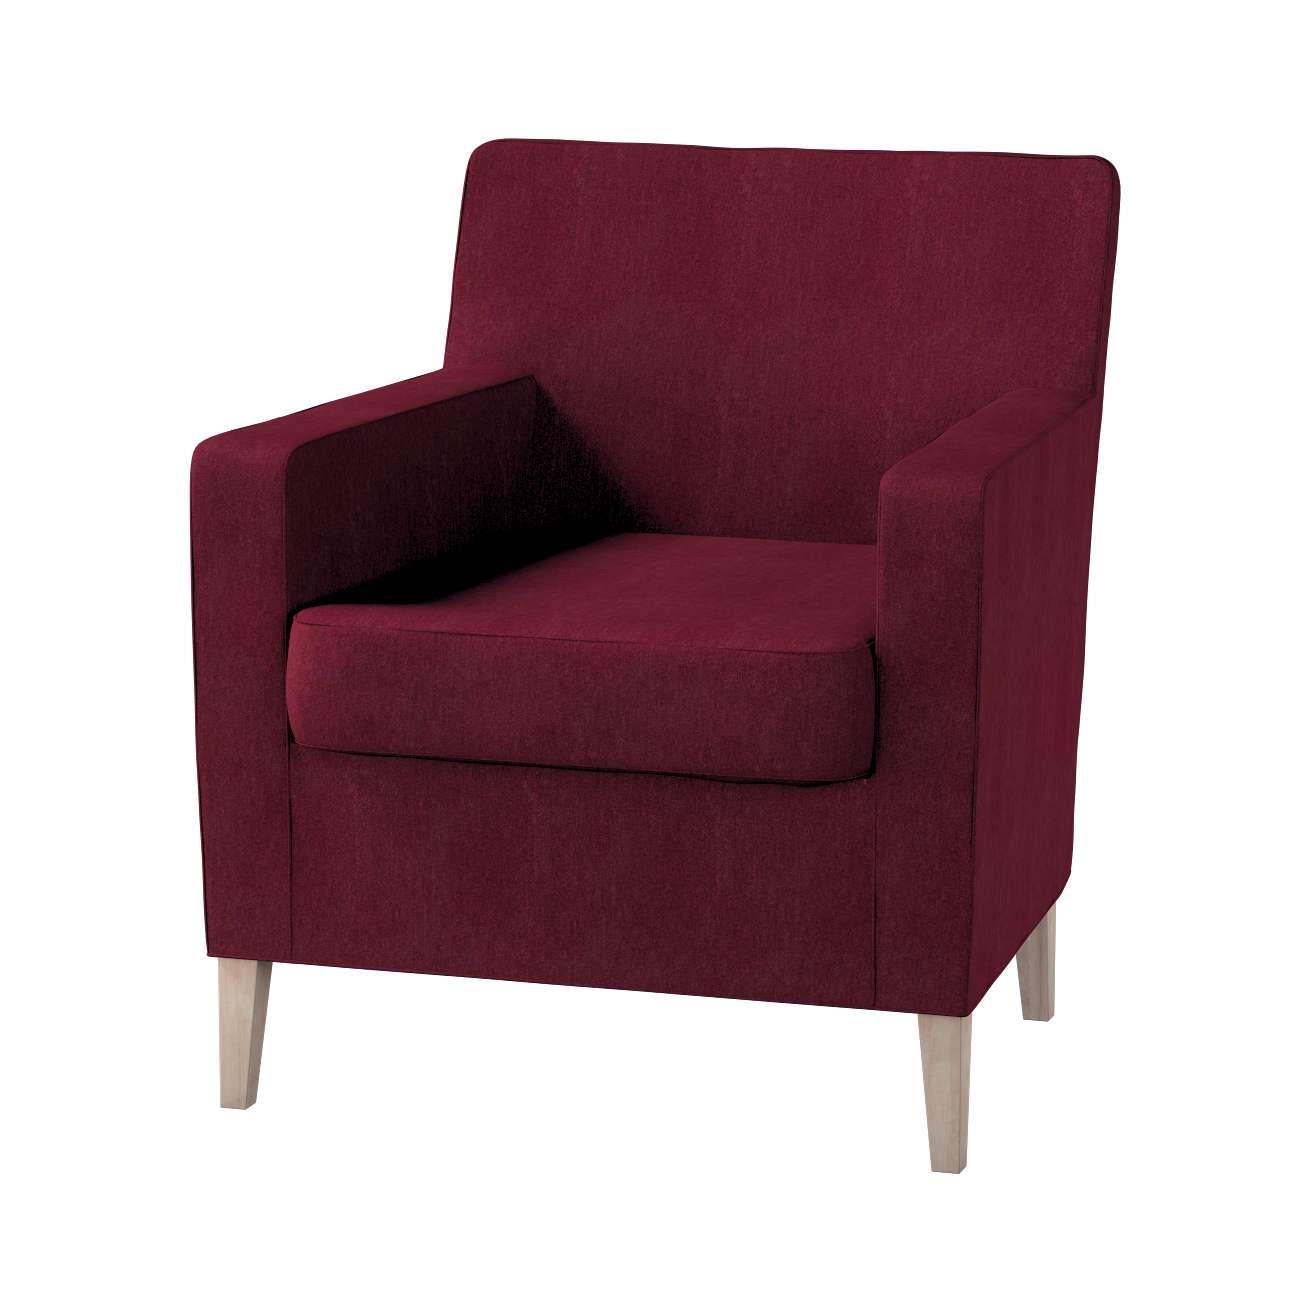 Pokrowiec na fotel Karlstad Fotel  Karlstad w kolekcji Chenille, tkanina: 702-19